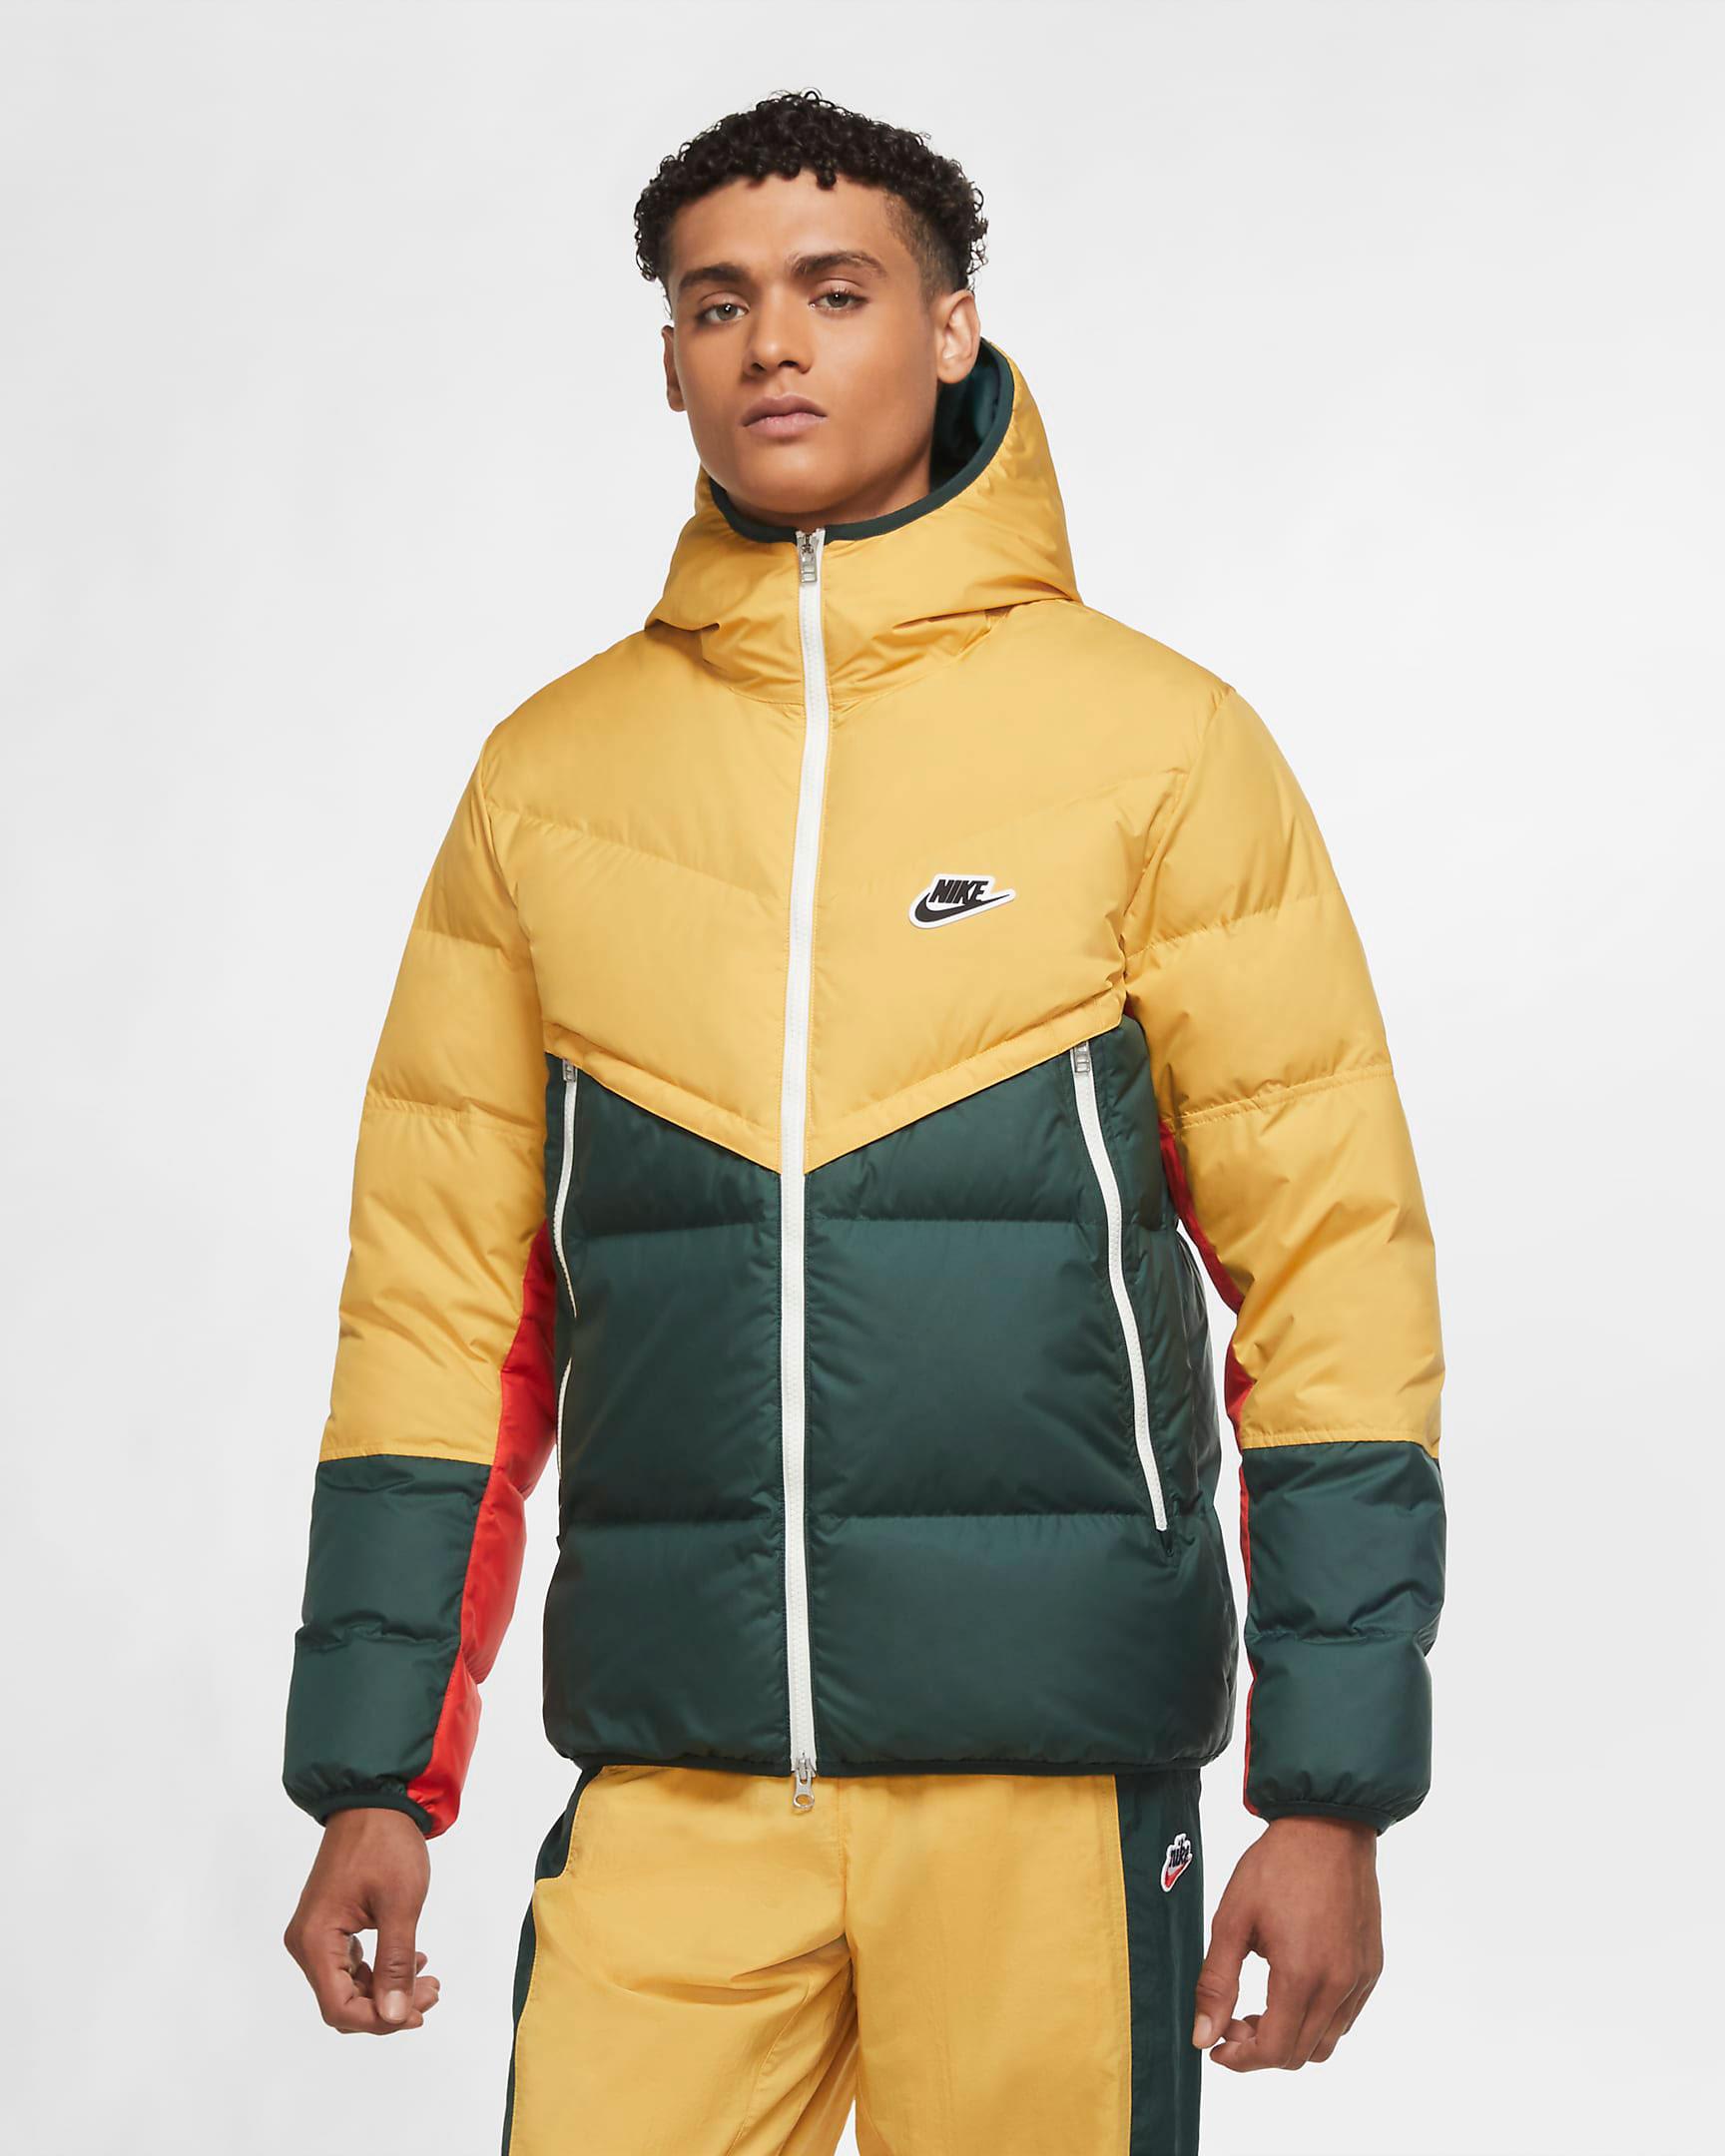 nike-air-max-1-lemonade-yellow-jacket